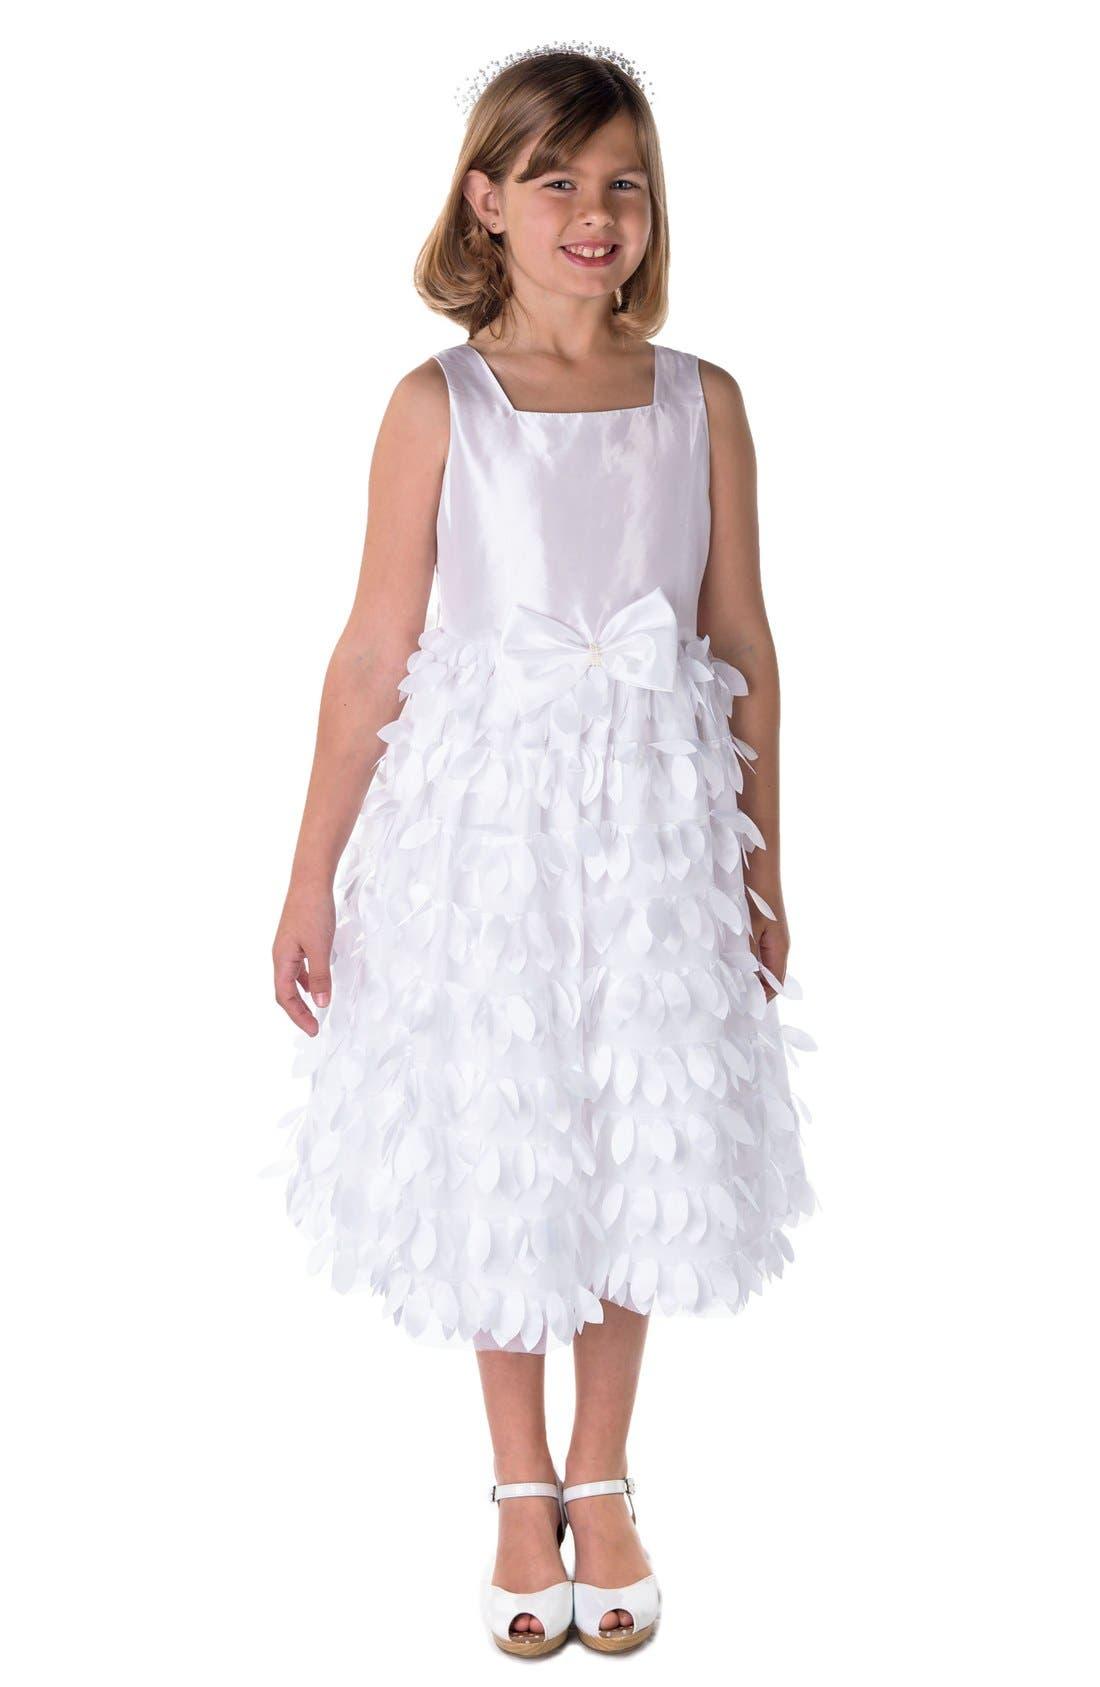 Sorbet 'Petal' Taffeta Flower Girl Dress (Toddler Girls, Little Girls & Big Girls)